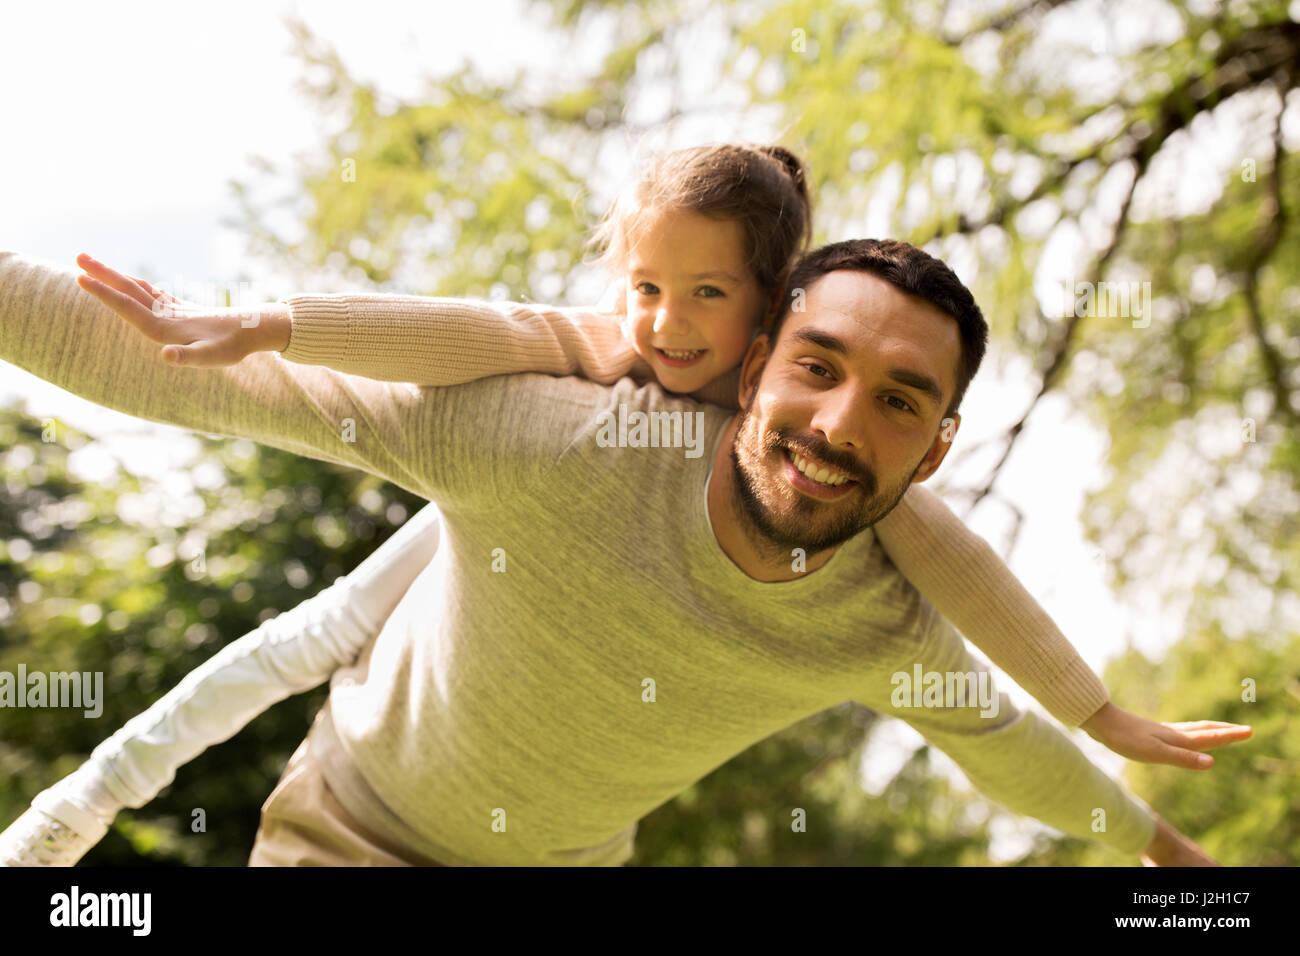 happy family having fun in summer park - Stock Image